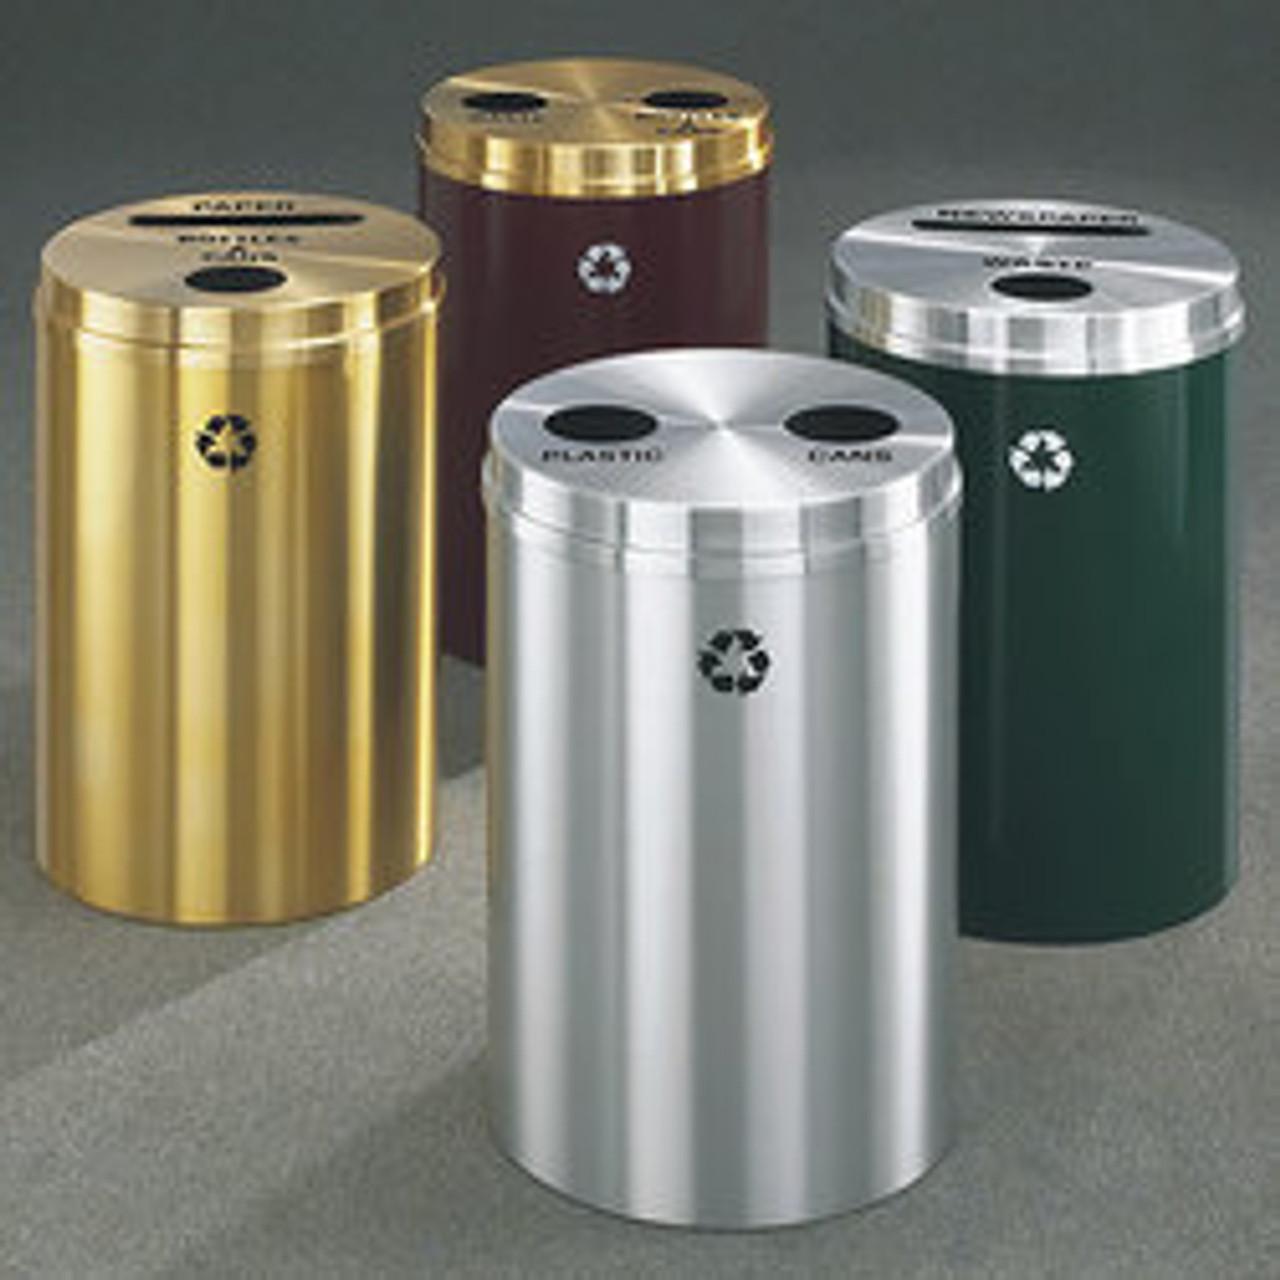 Glaro RecyclePro 2 Recycling Bins